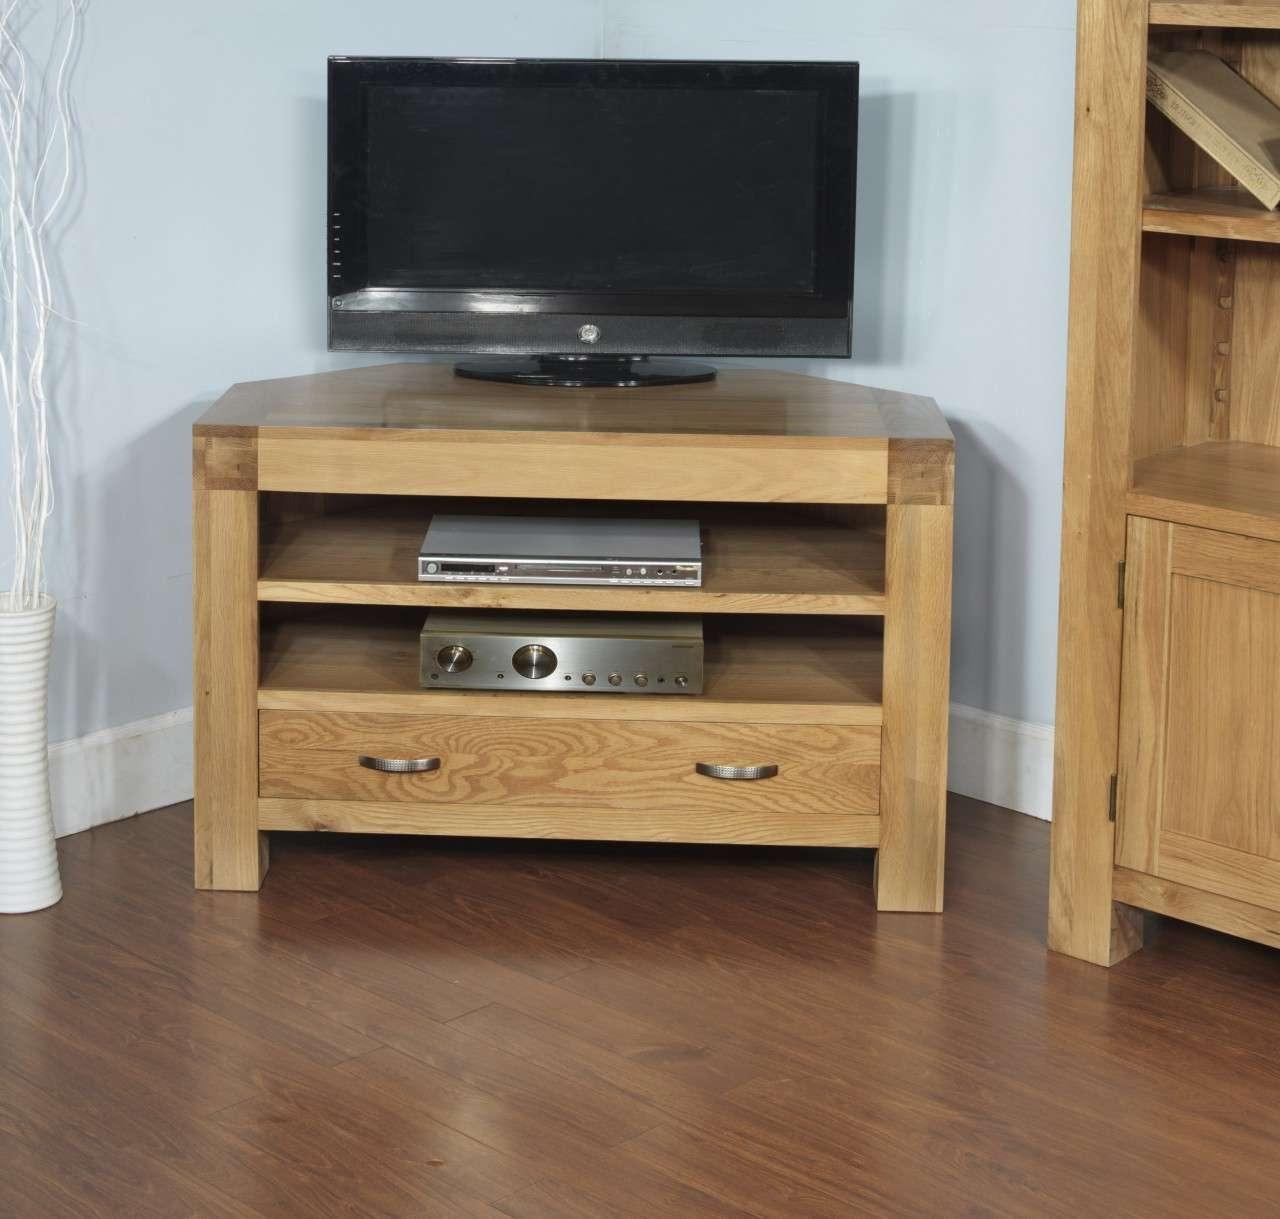 Rivermead Solid Oak Modern Furniture Widescreen Corner Tv Cabinet Inside Real Wood Corner Tv Stands (View 8 of 15)